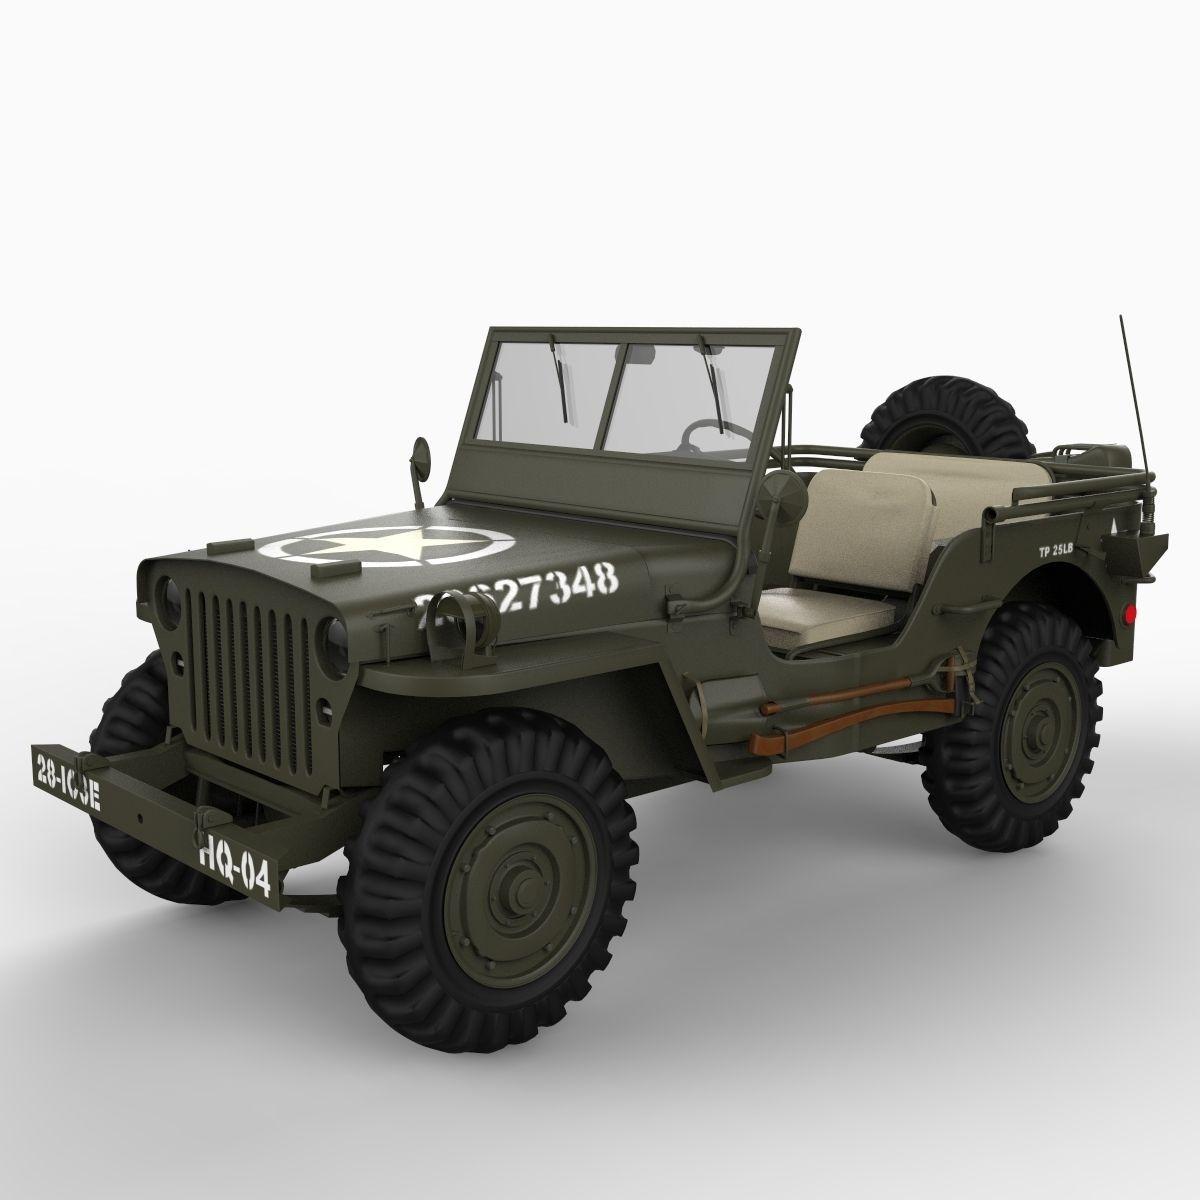 realistic willys jeep 3d model max obj 3ds c4d lwo lw lws ma mb. Black Bedroom Furniture Sets. Home Design Ideas